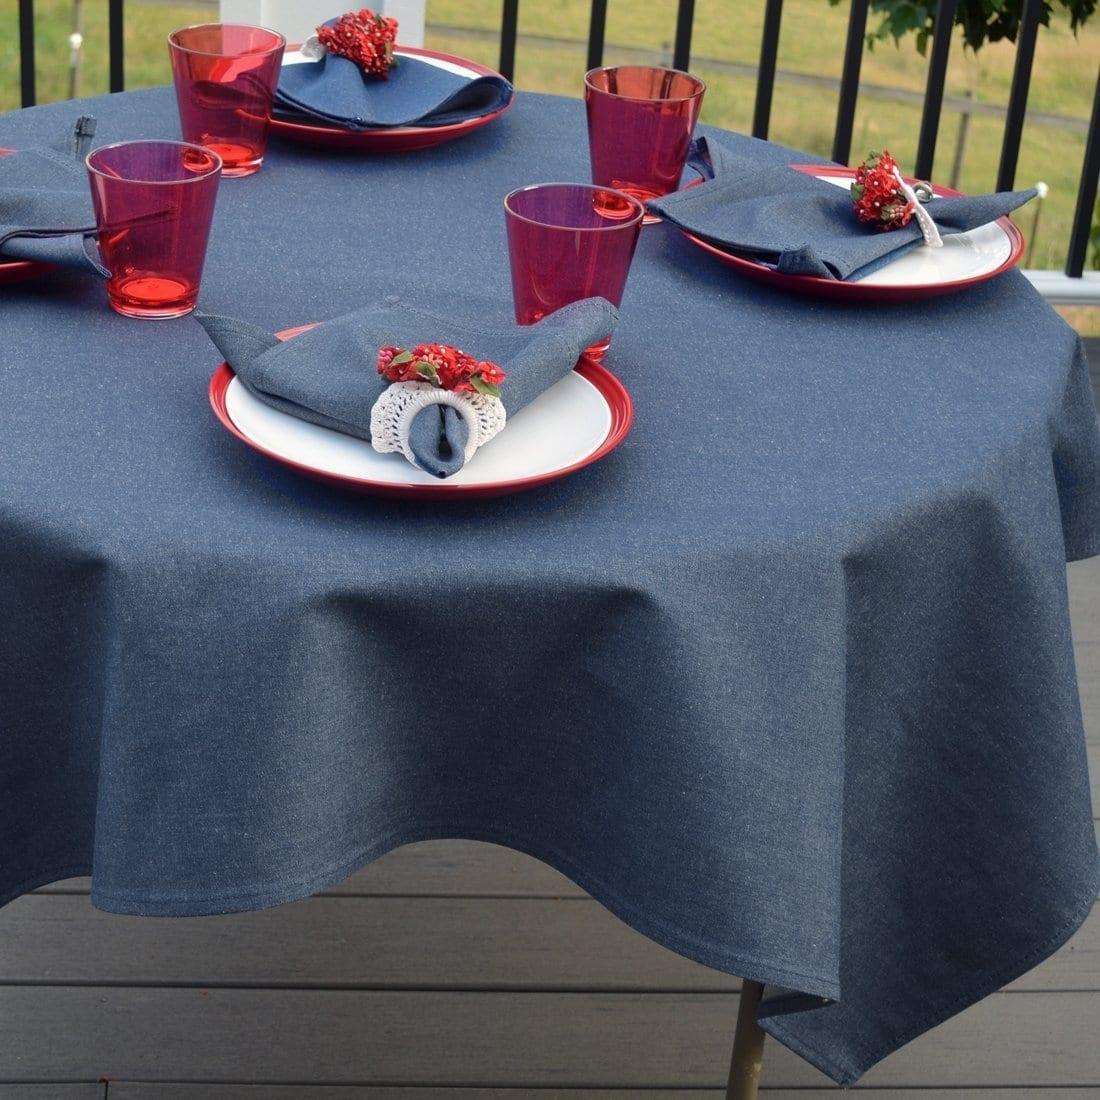 Sweet Pea Linens - Darker Blue Denim 54 inch Square Table Cloth (SKU#: R-1008-B26) - Table Setting